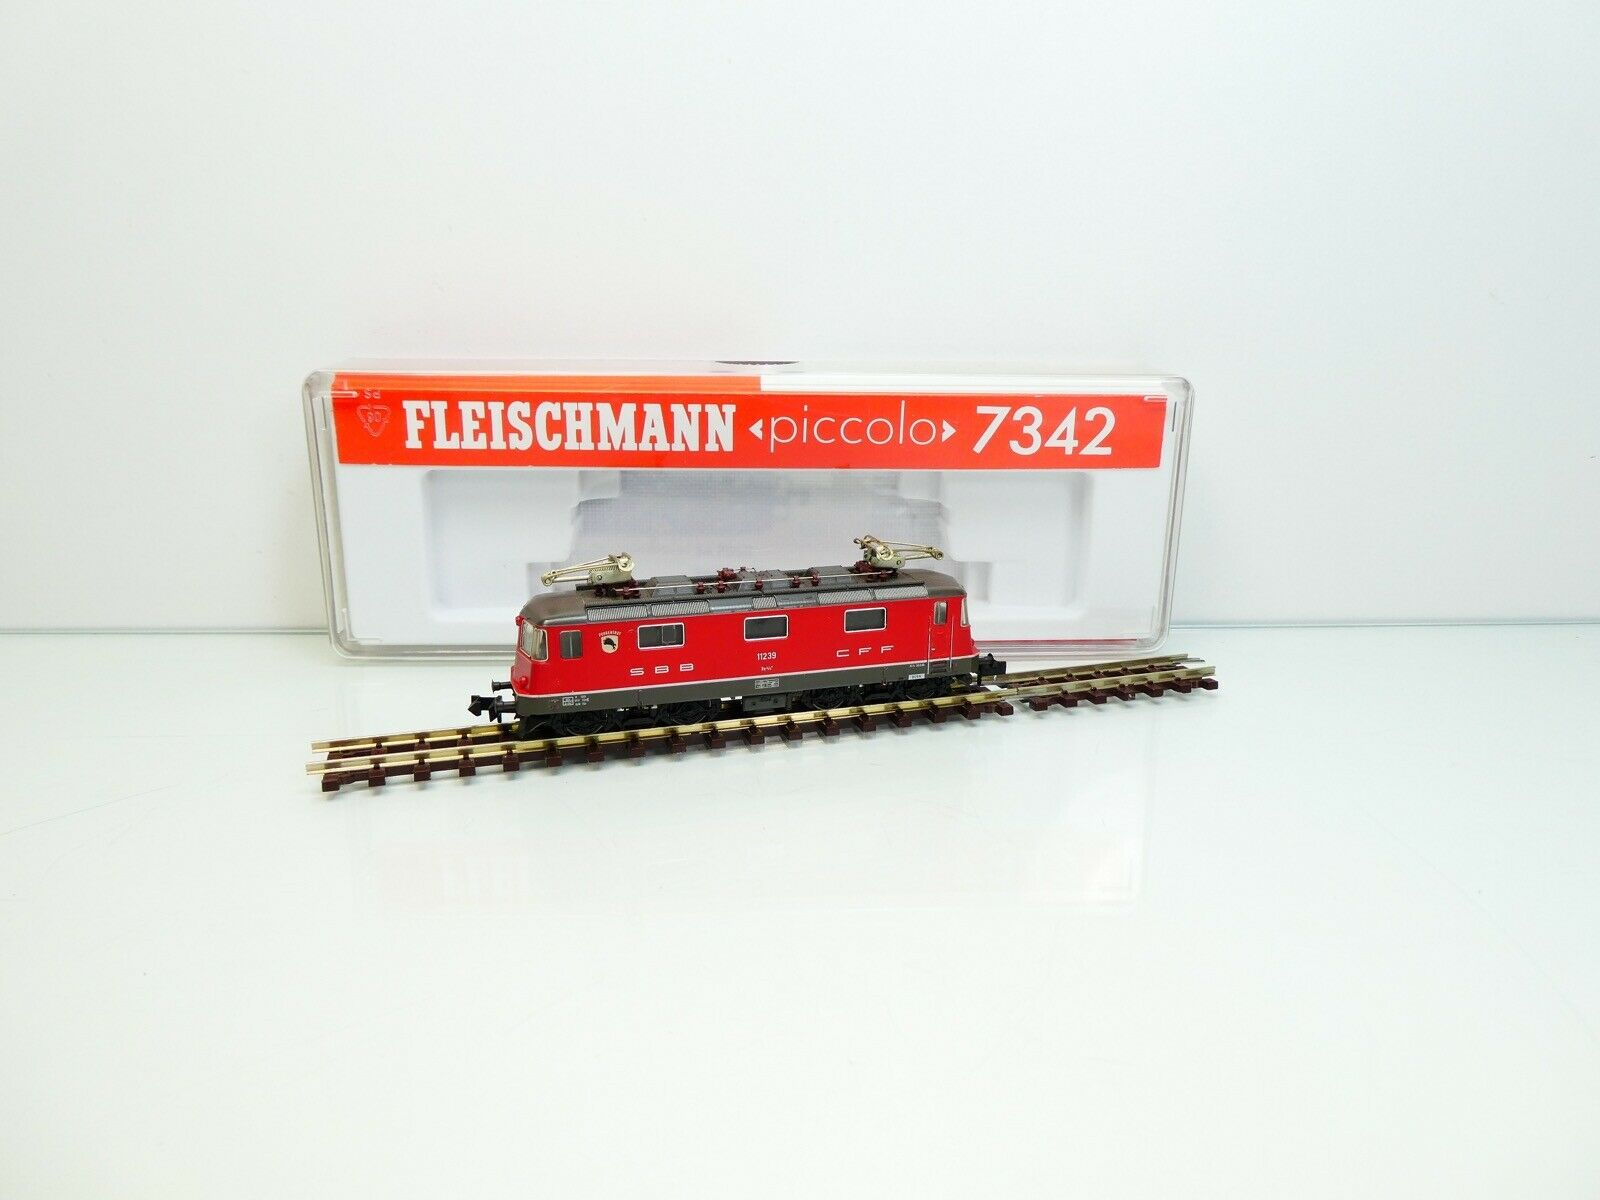 Fleischmann 7342 - Spur N - SBB FSS - E-Lok 112 39  - TOP in OVP -  1841